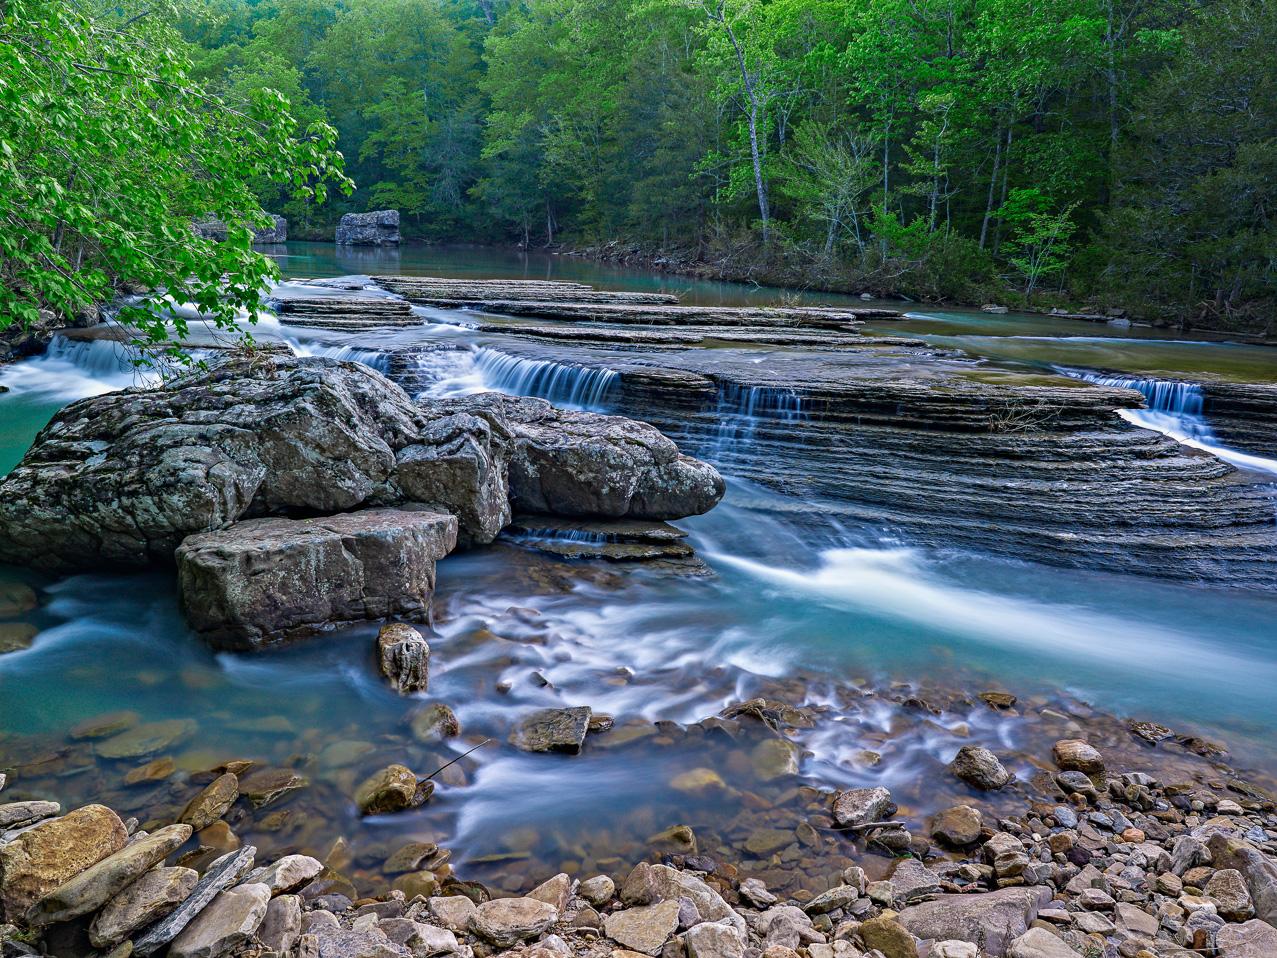 falls creek singles over 50 53-year-old man seeking women 20-50 single  wisconsin singles,  richmond edgerton antigo fort atkinson oak creek ripon.